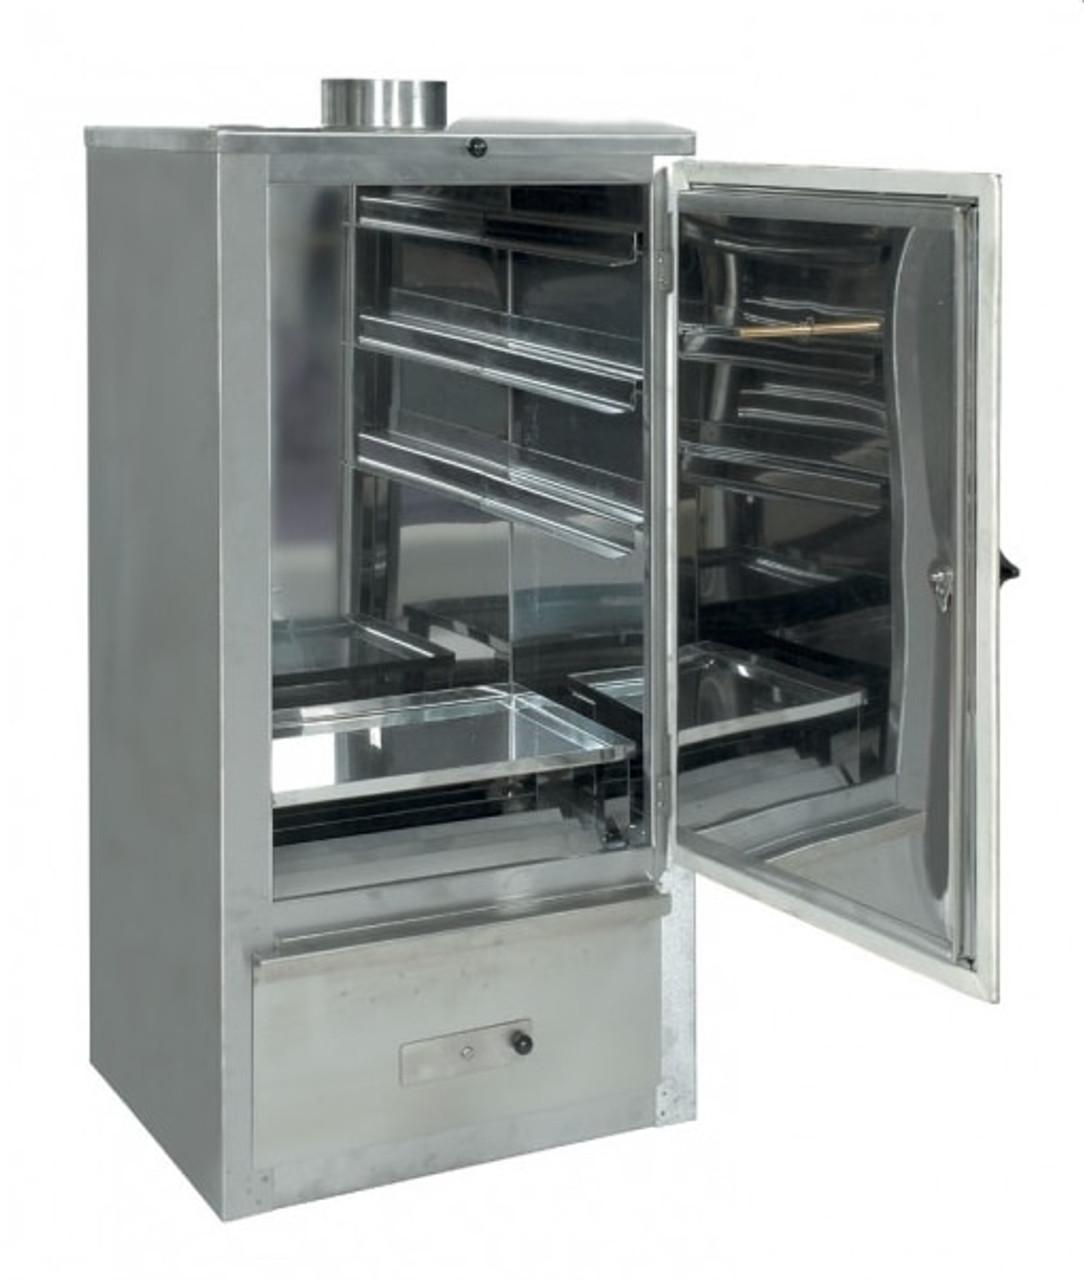 Beelonia F1 Smoking Oven - Wood Heated Smoker